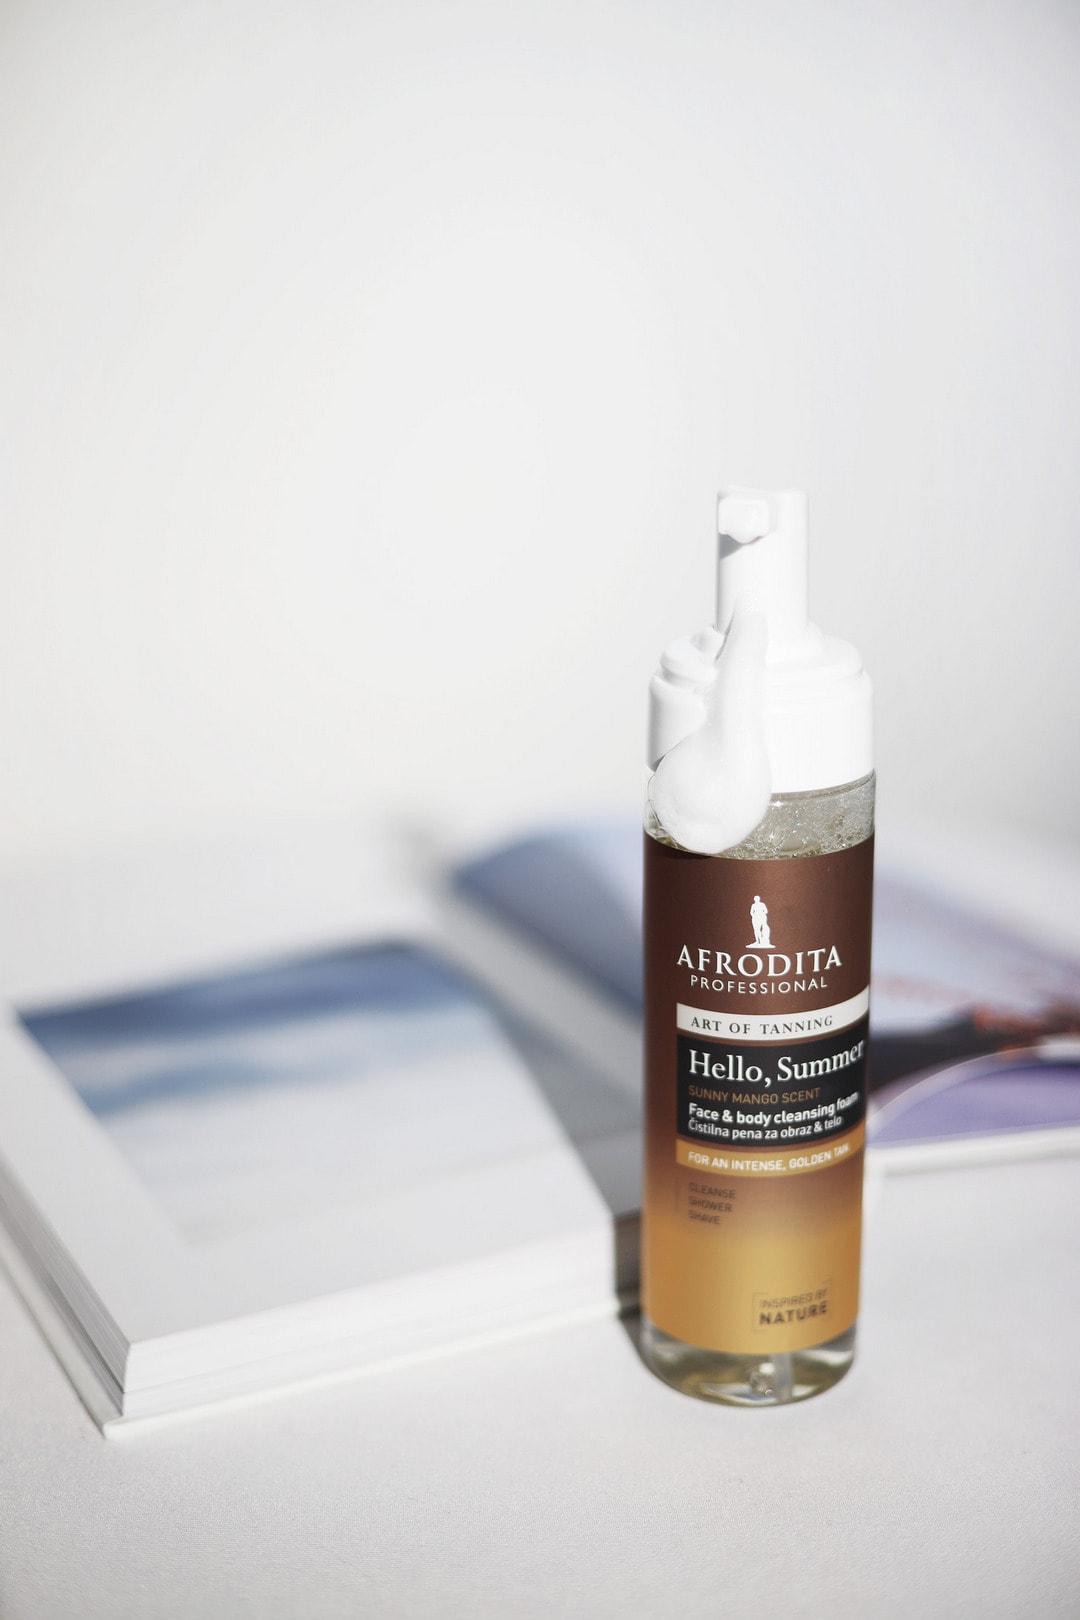 Afrodita Art of Tanning